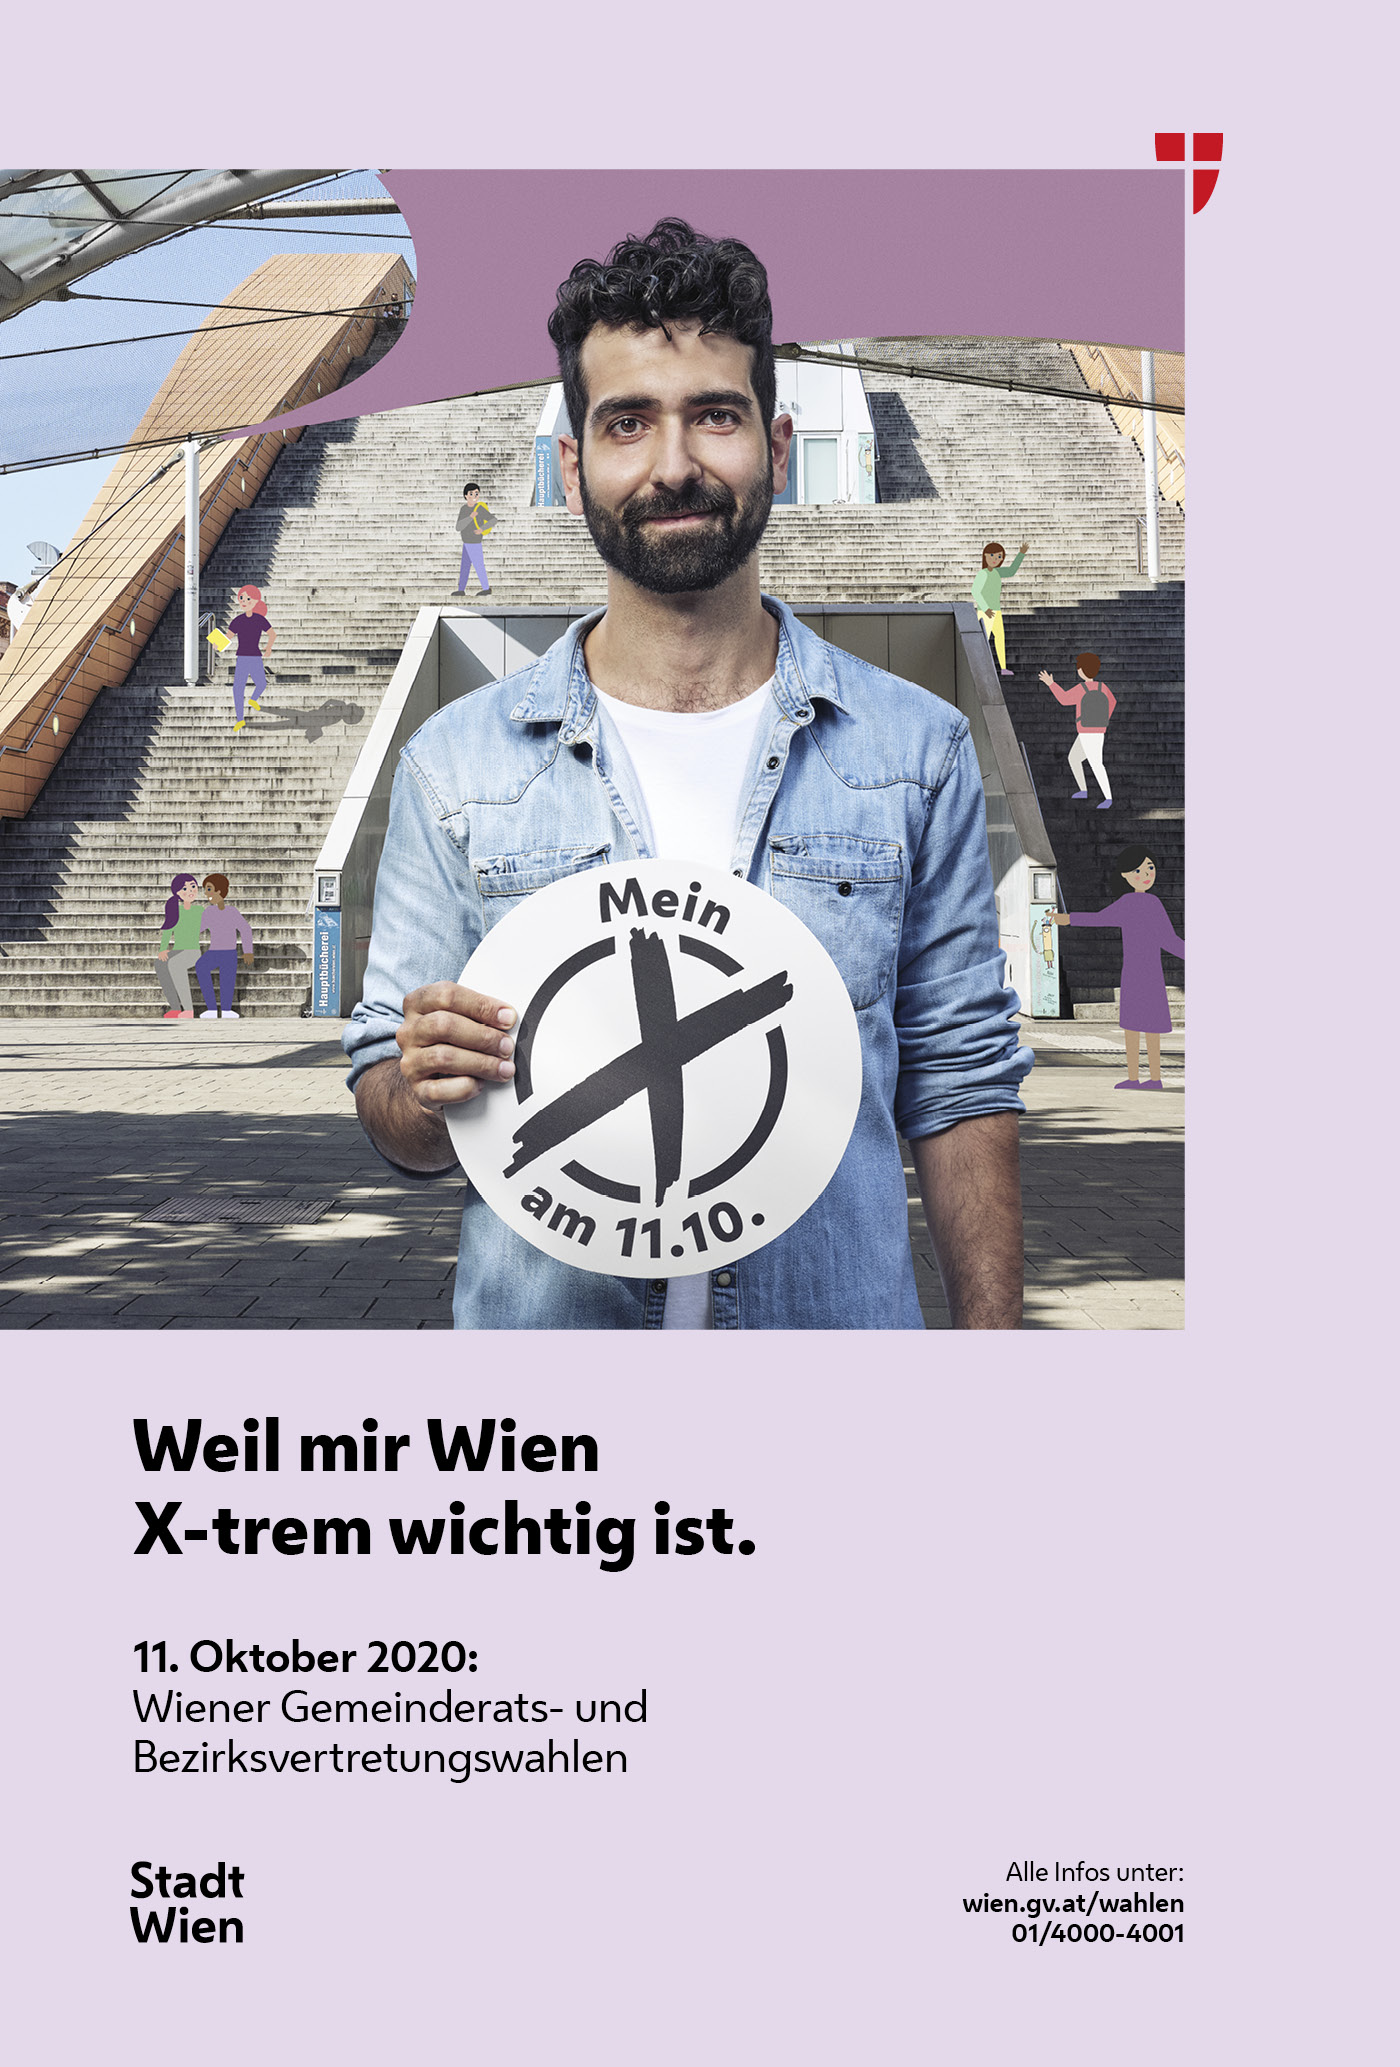 WienWahl Image CL 1185x1750 02 09 203 13. Juni 2021